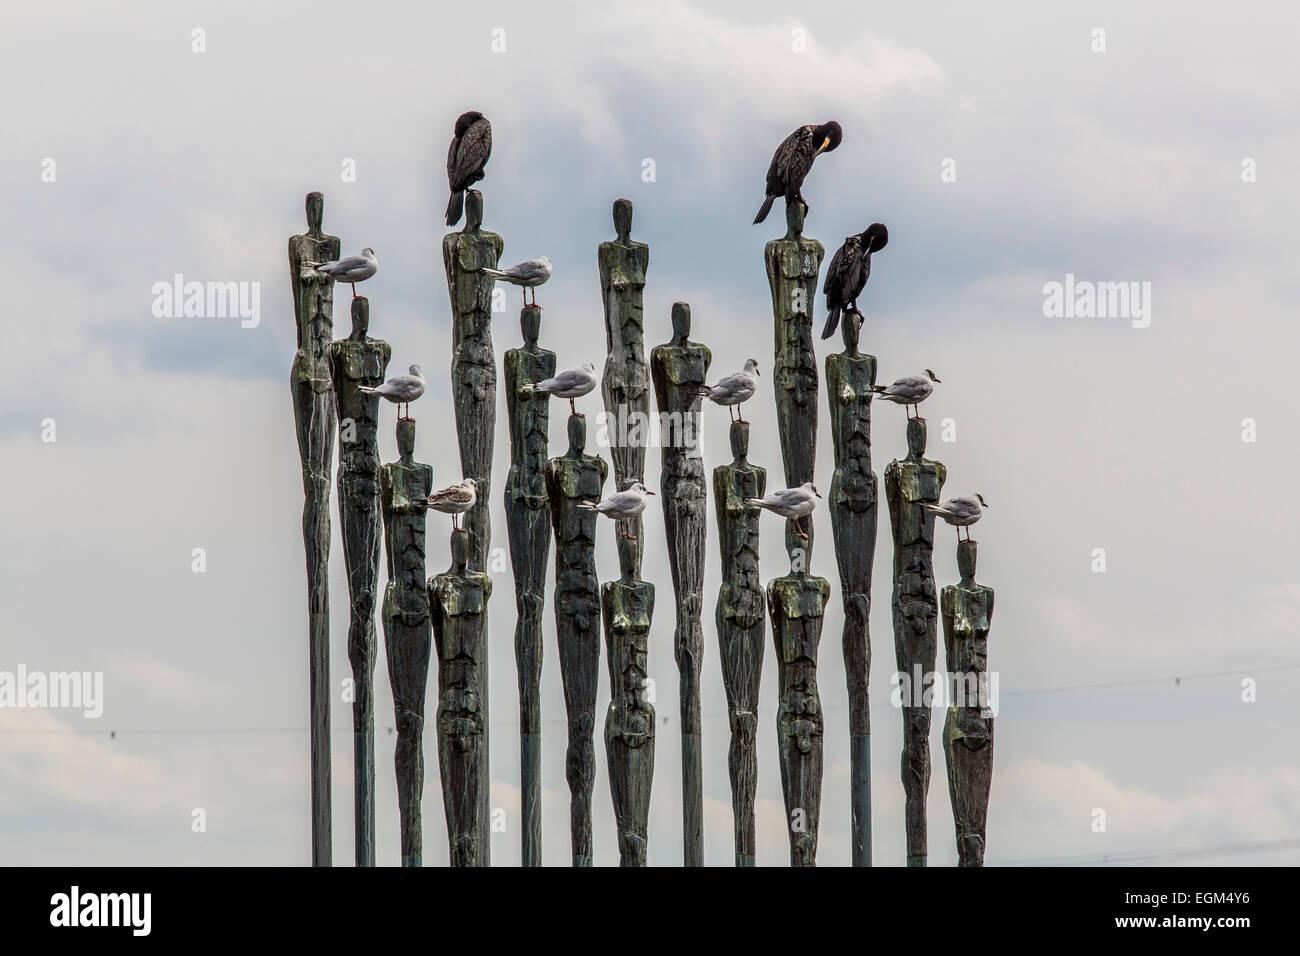 Birds on a sculpture - Stock Image